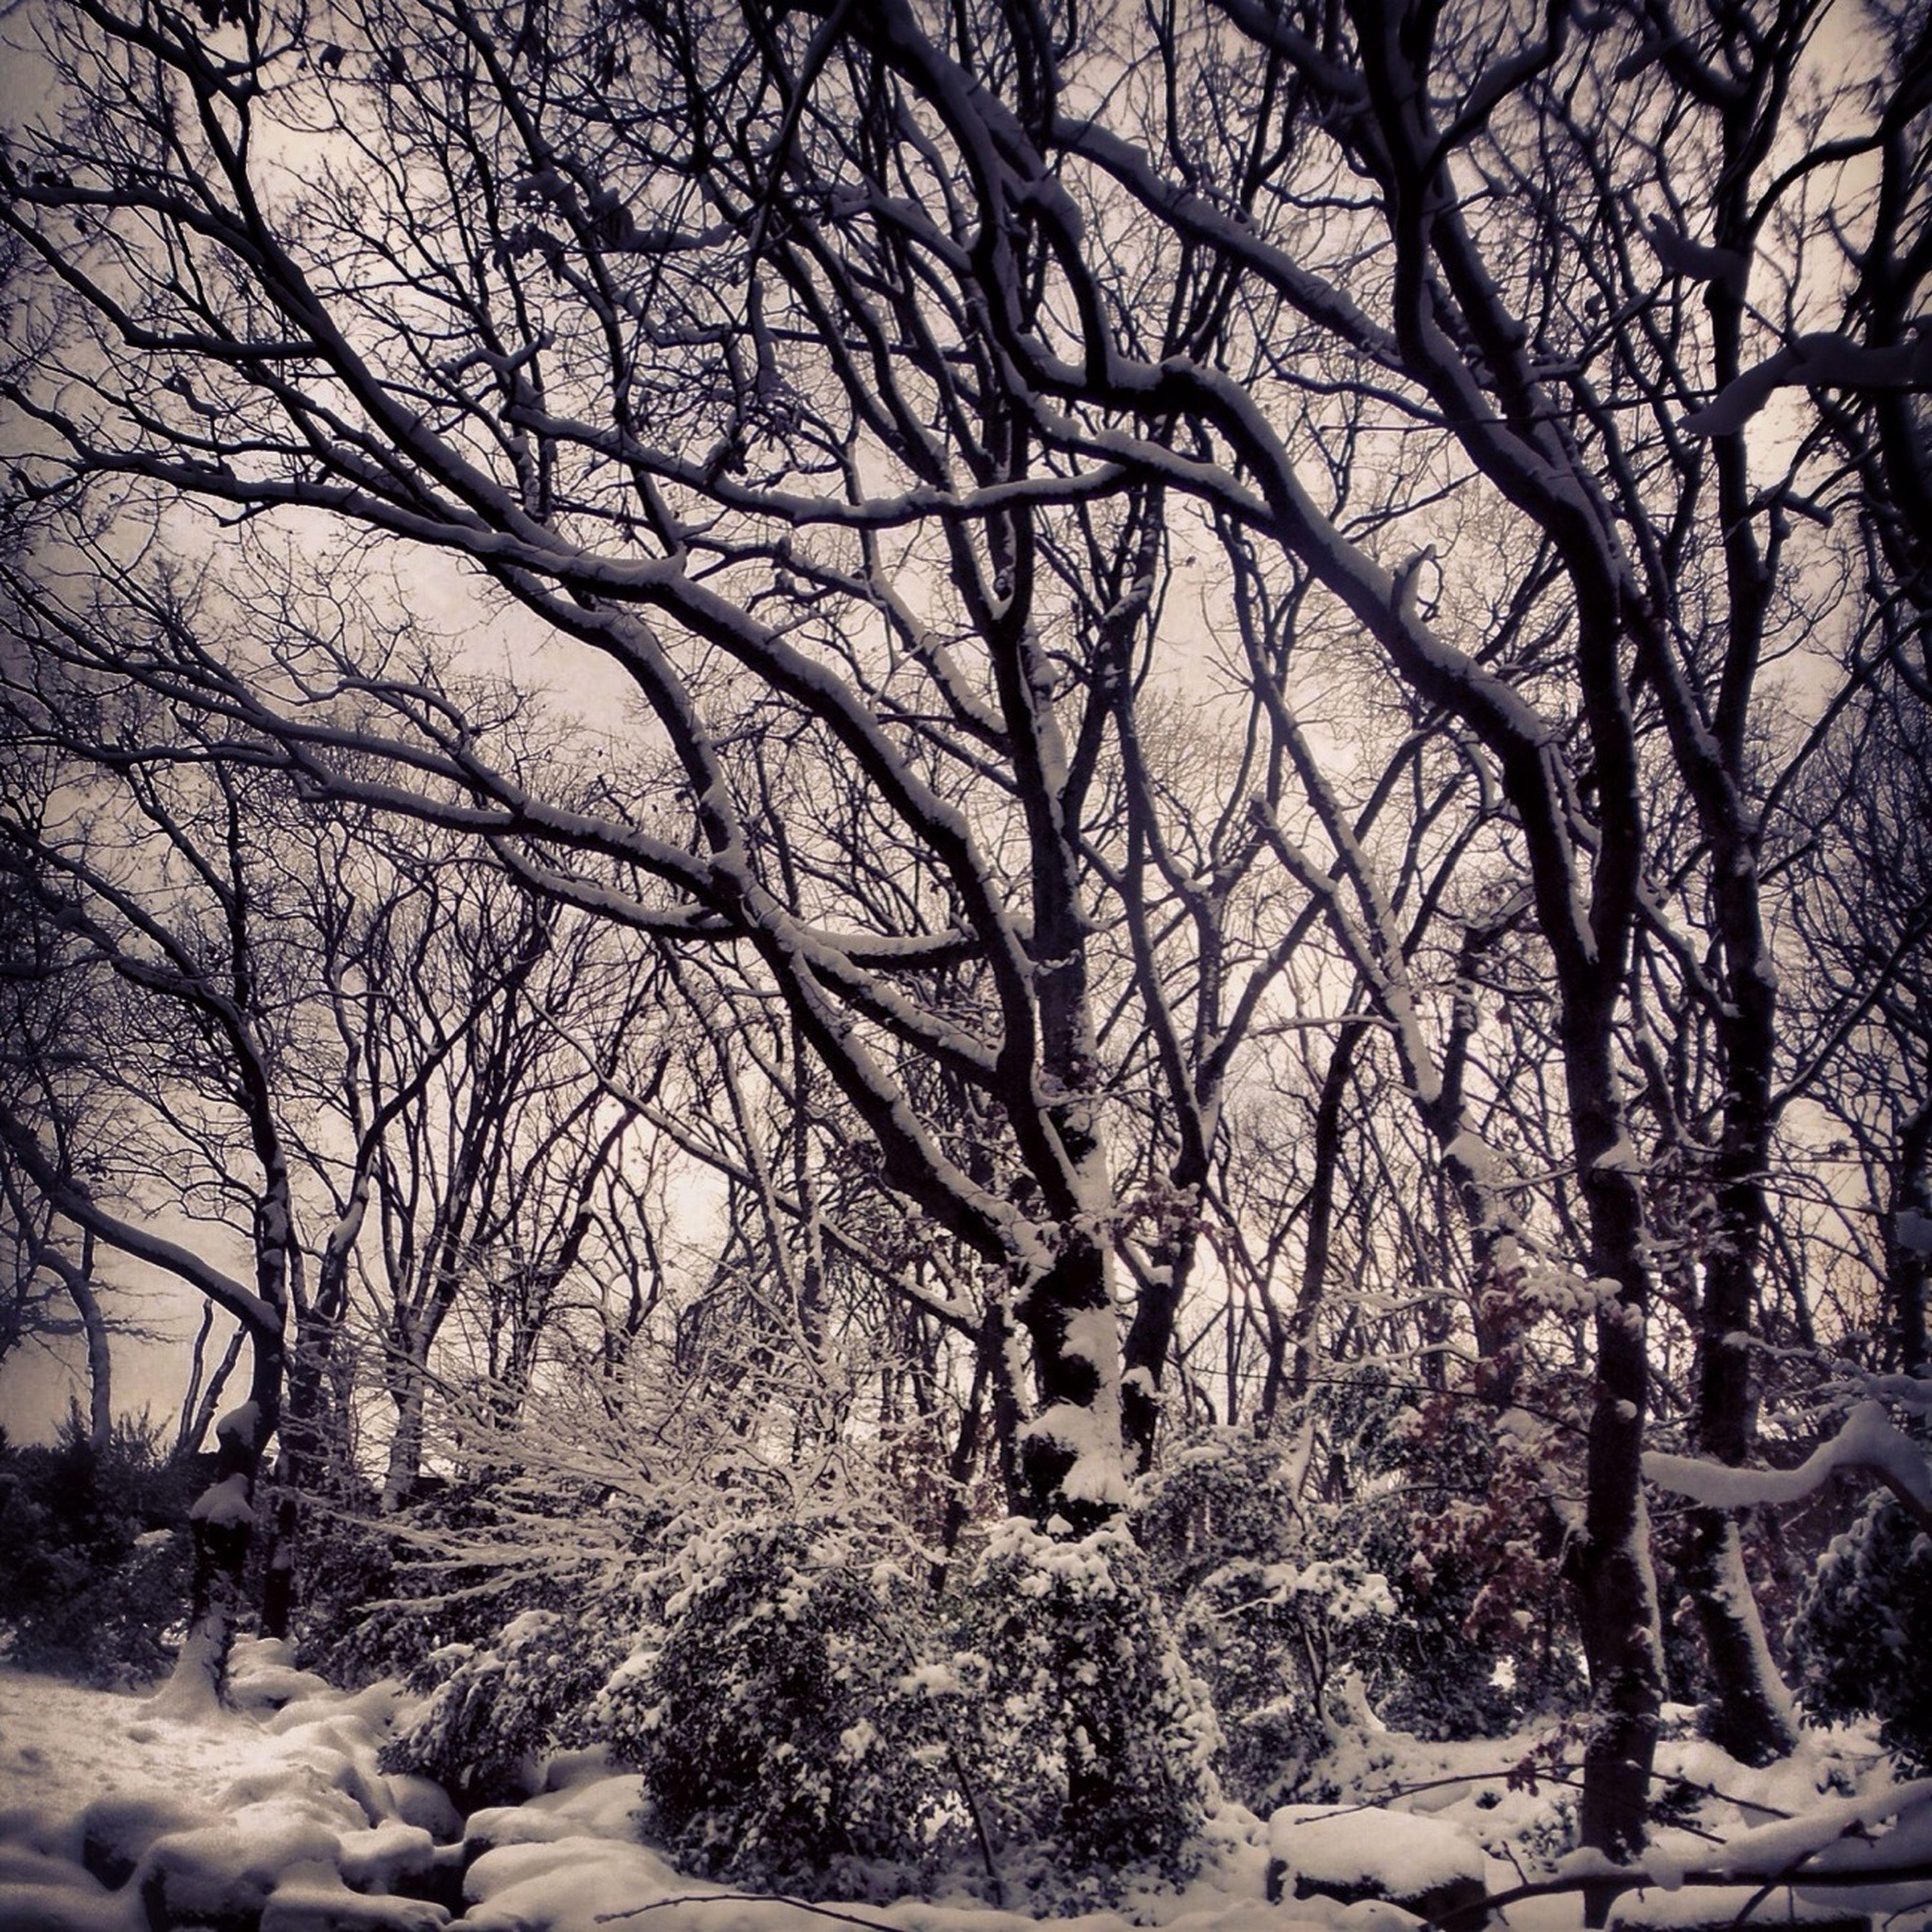 snow, winter, cold temperature, bare tree, tree, season, branch, weather, tranquility, tranquil scene, covering, nature, frozen, beauty in nature, scenics, landscape, covered, non-urban scene, cold, sky